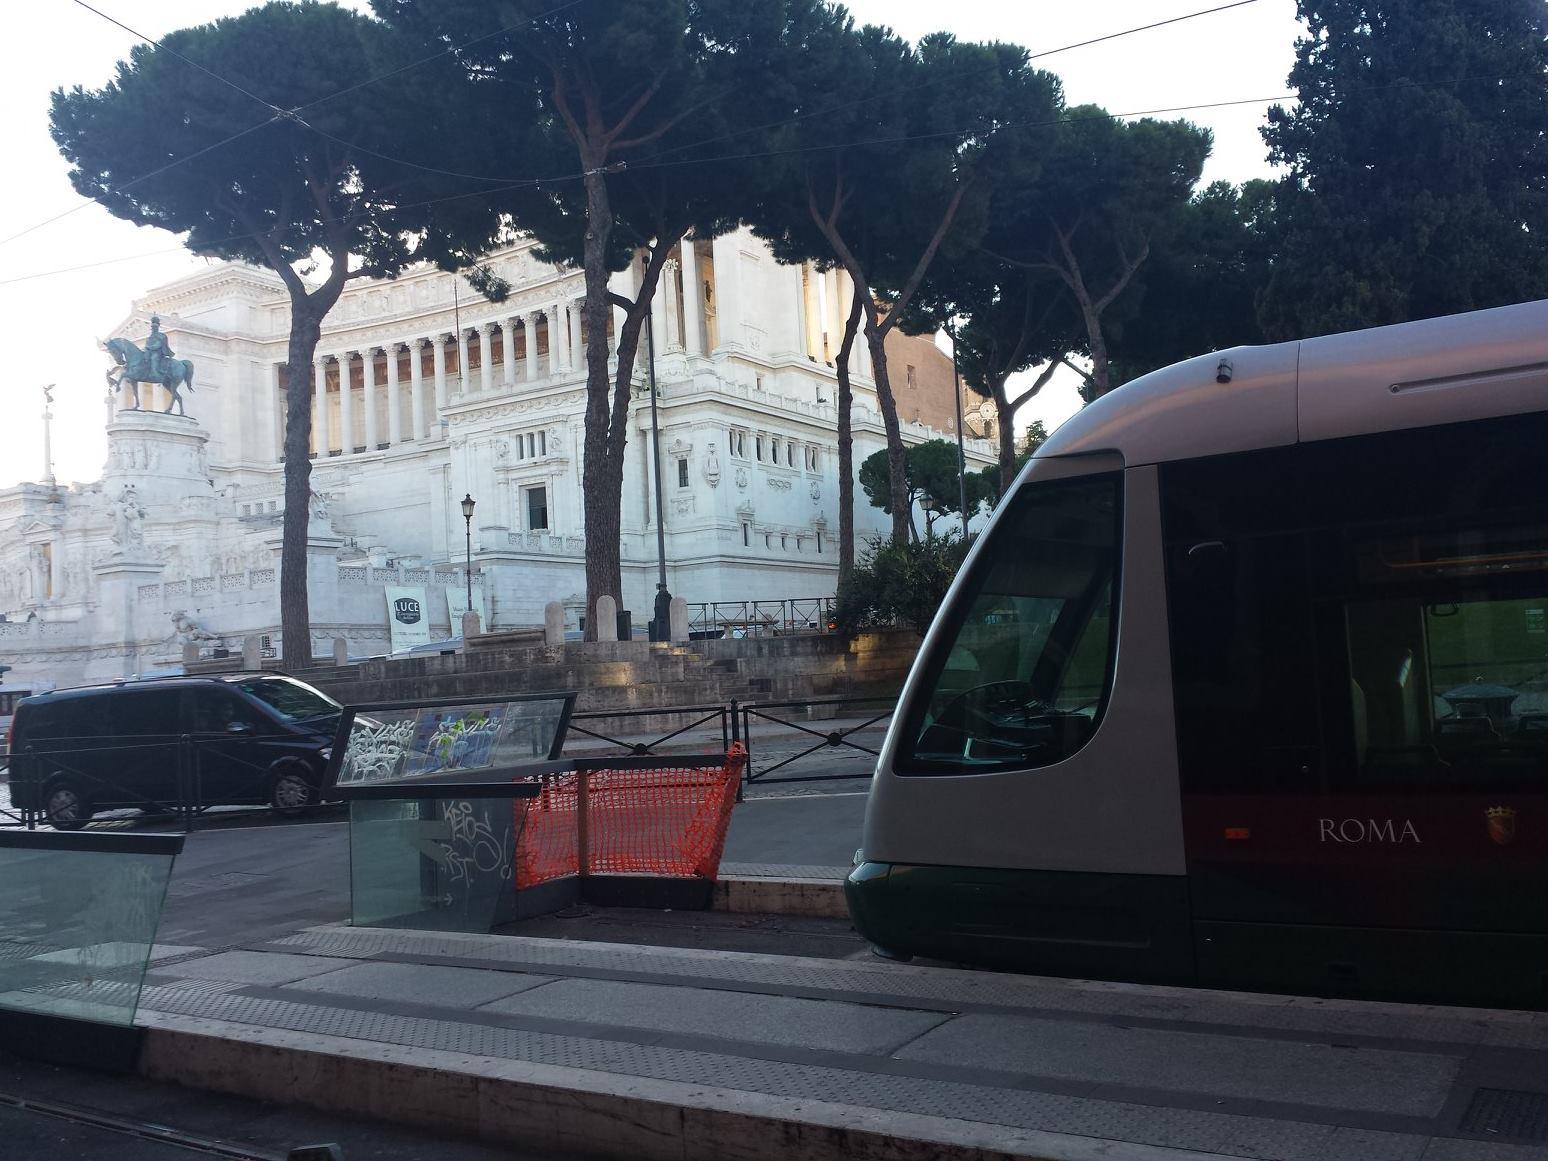 transportes em Roma - TRAM 8 - PIAZZA VENEZIA